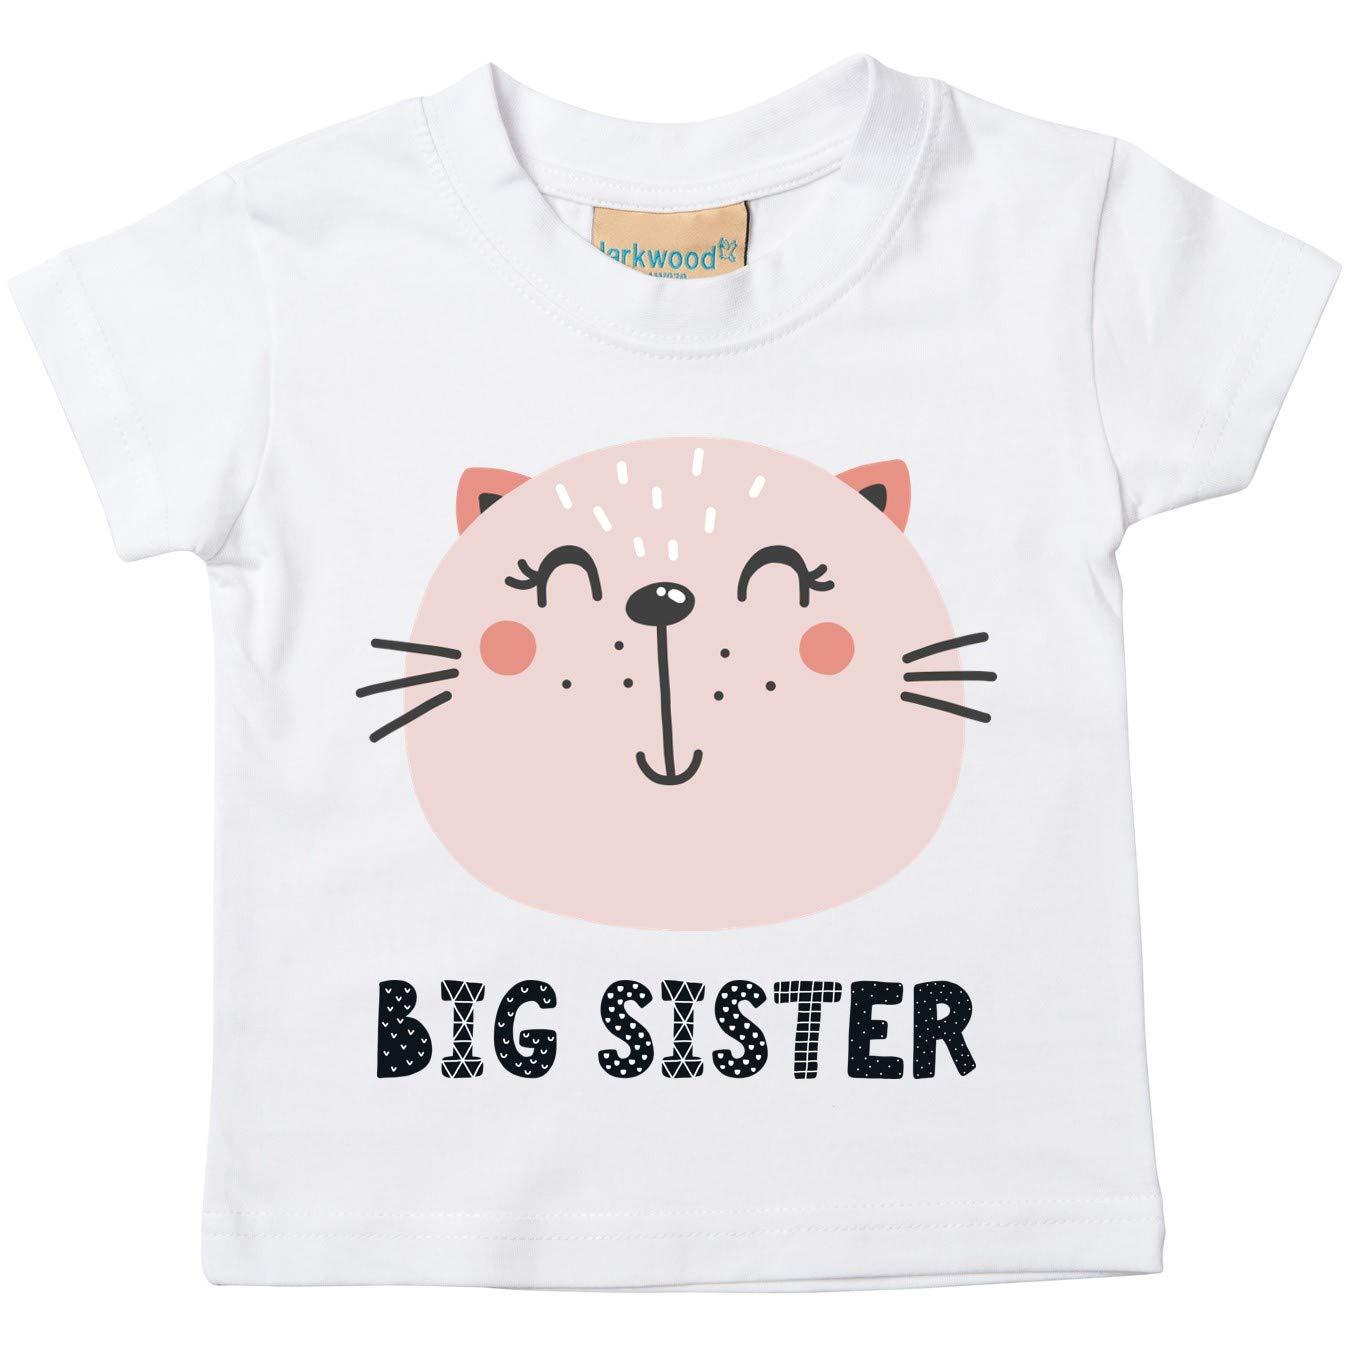 Toddlers Big Sister Animal T-Shirt